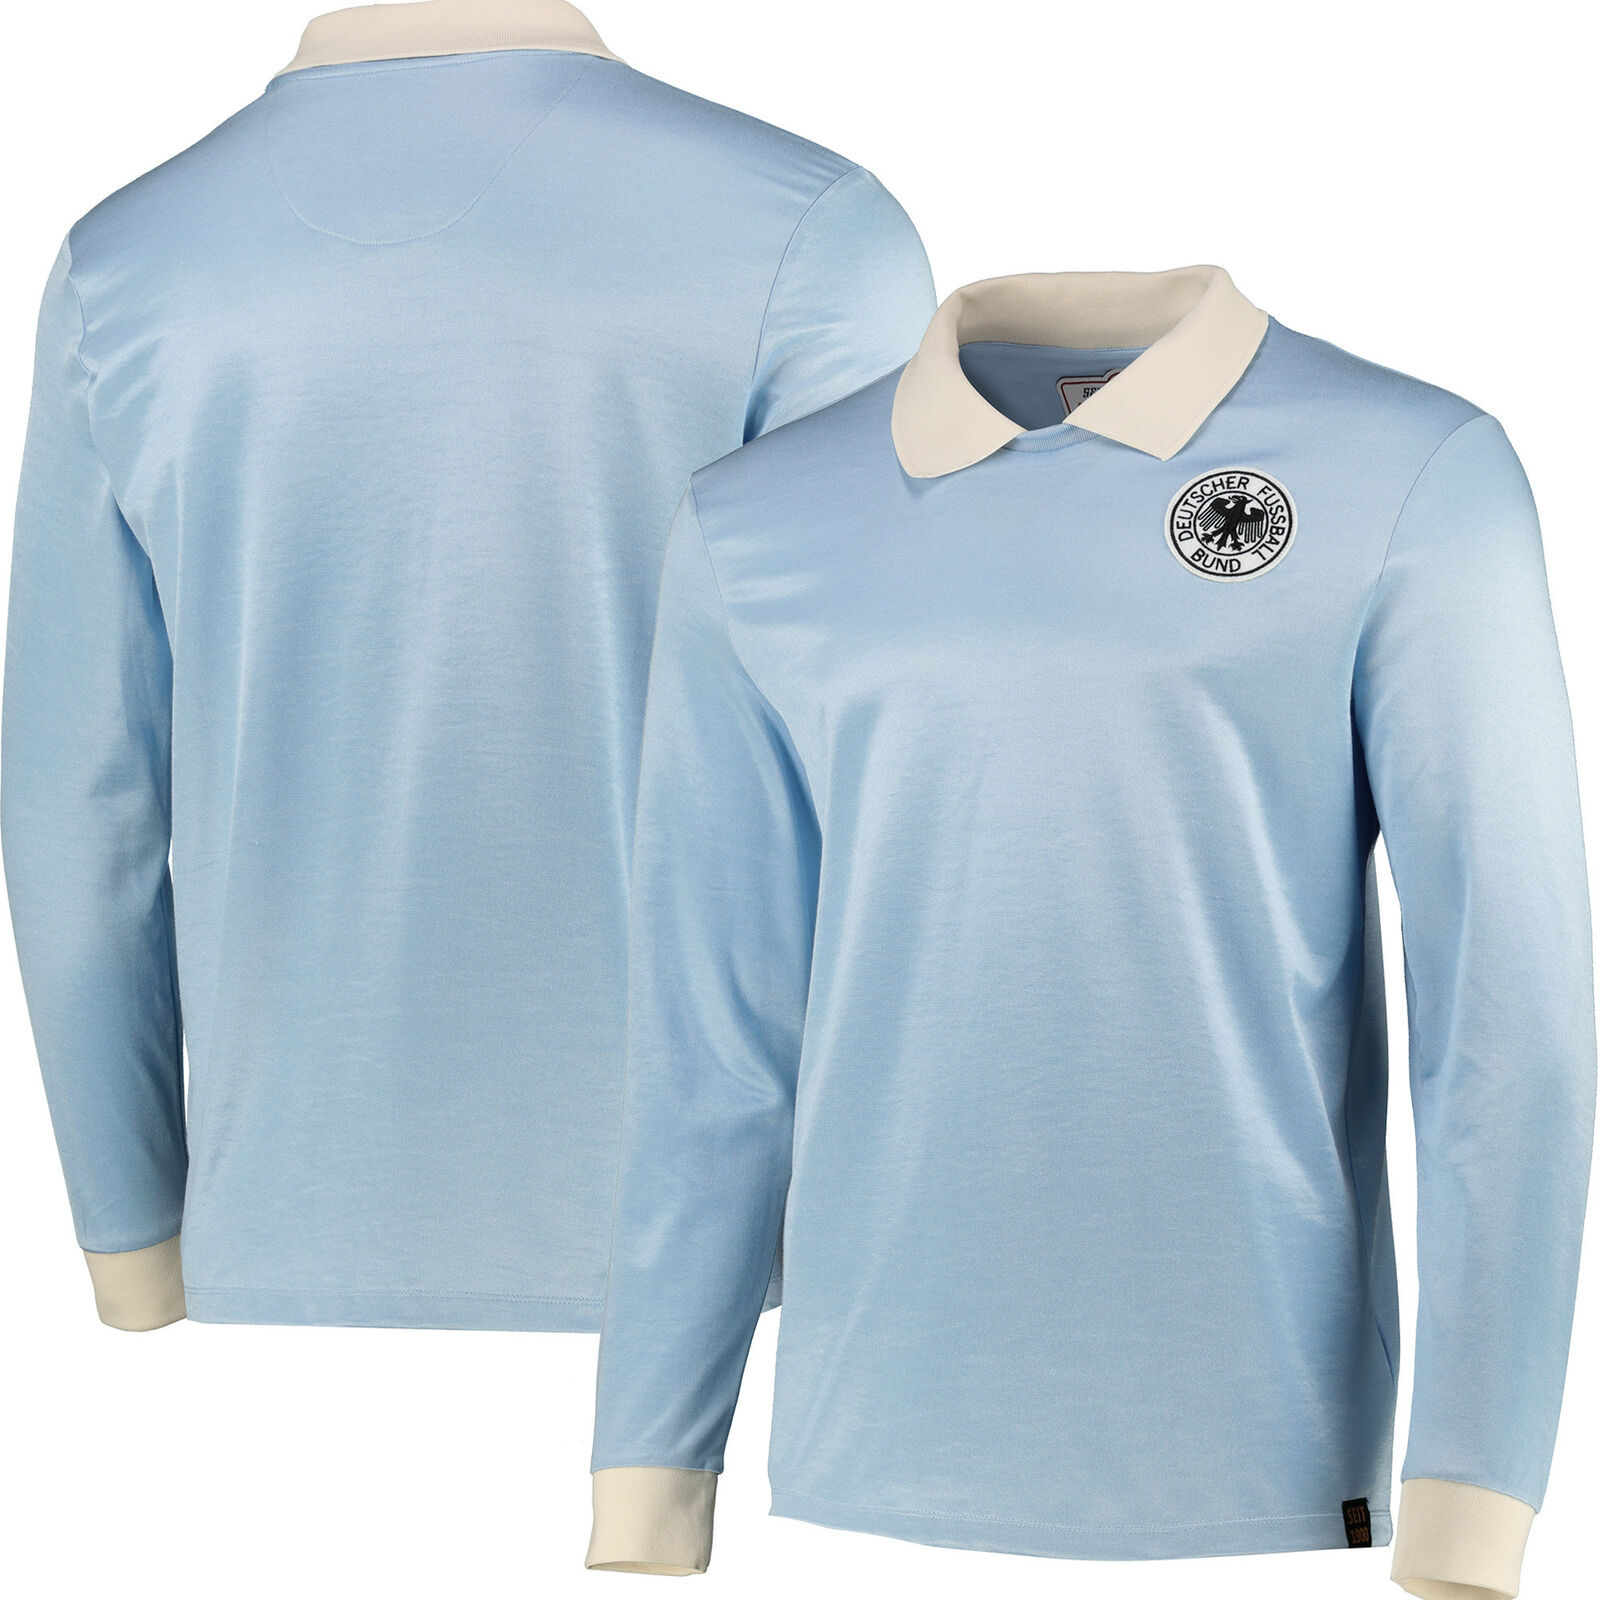 DFB True Classics 1974 Retro Goalkeeper Summer T-Shirt Shirt Blue - Mens